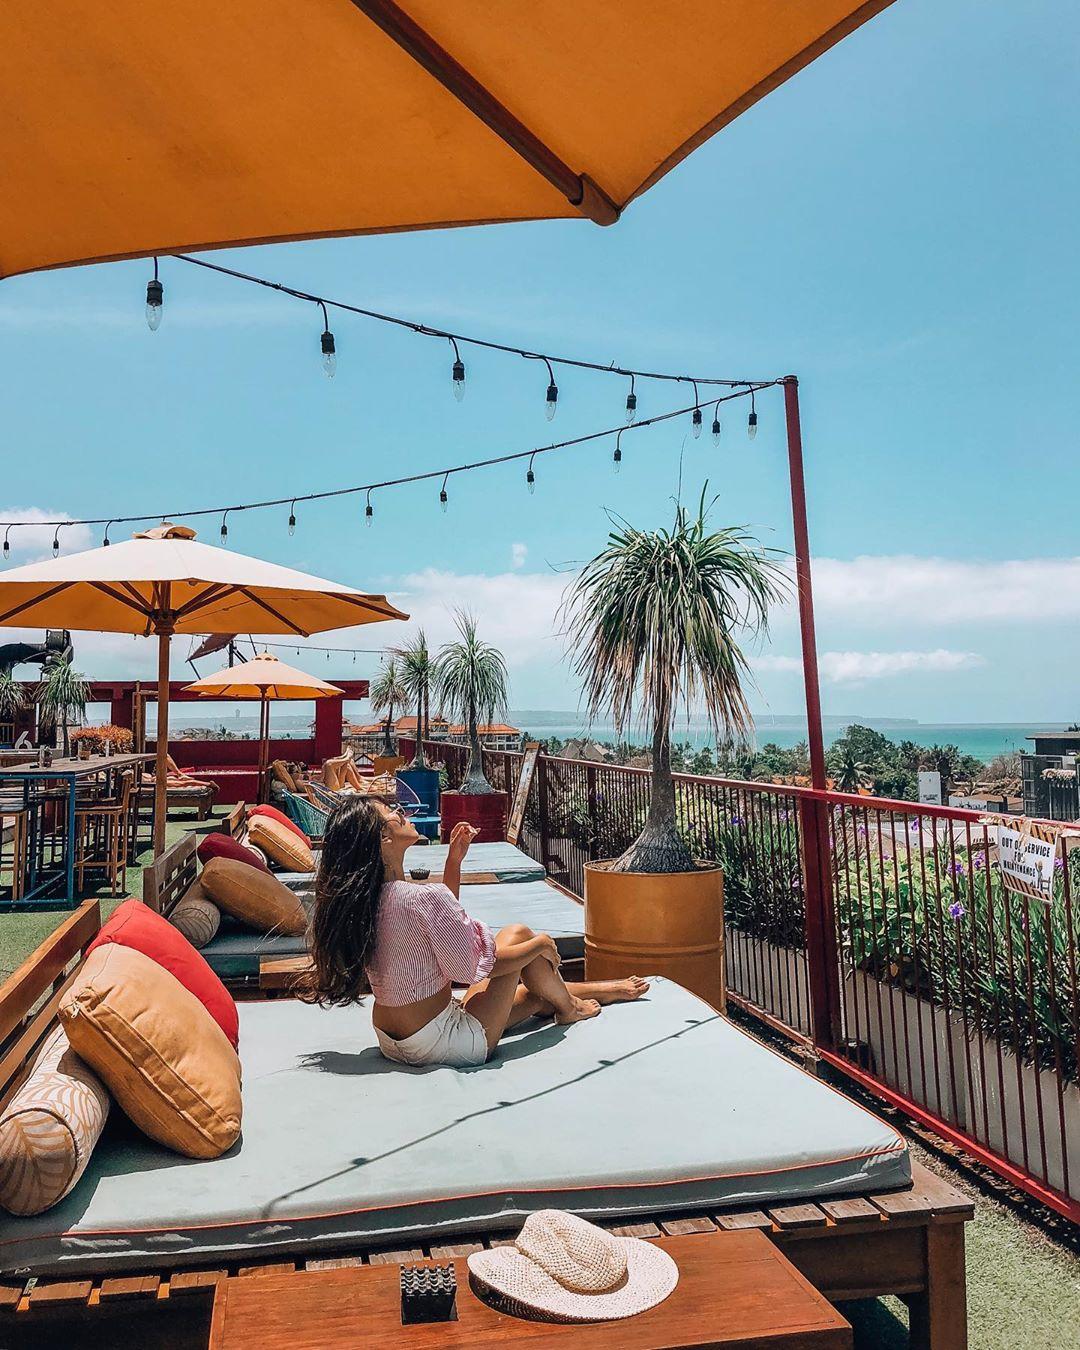 ATC | Japanese Influencer Connects with Dash Hotel Seminyak Bali via Influencer Marketing | 3